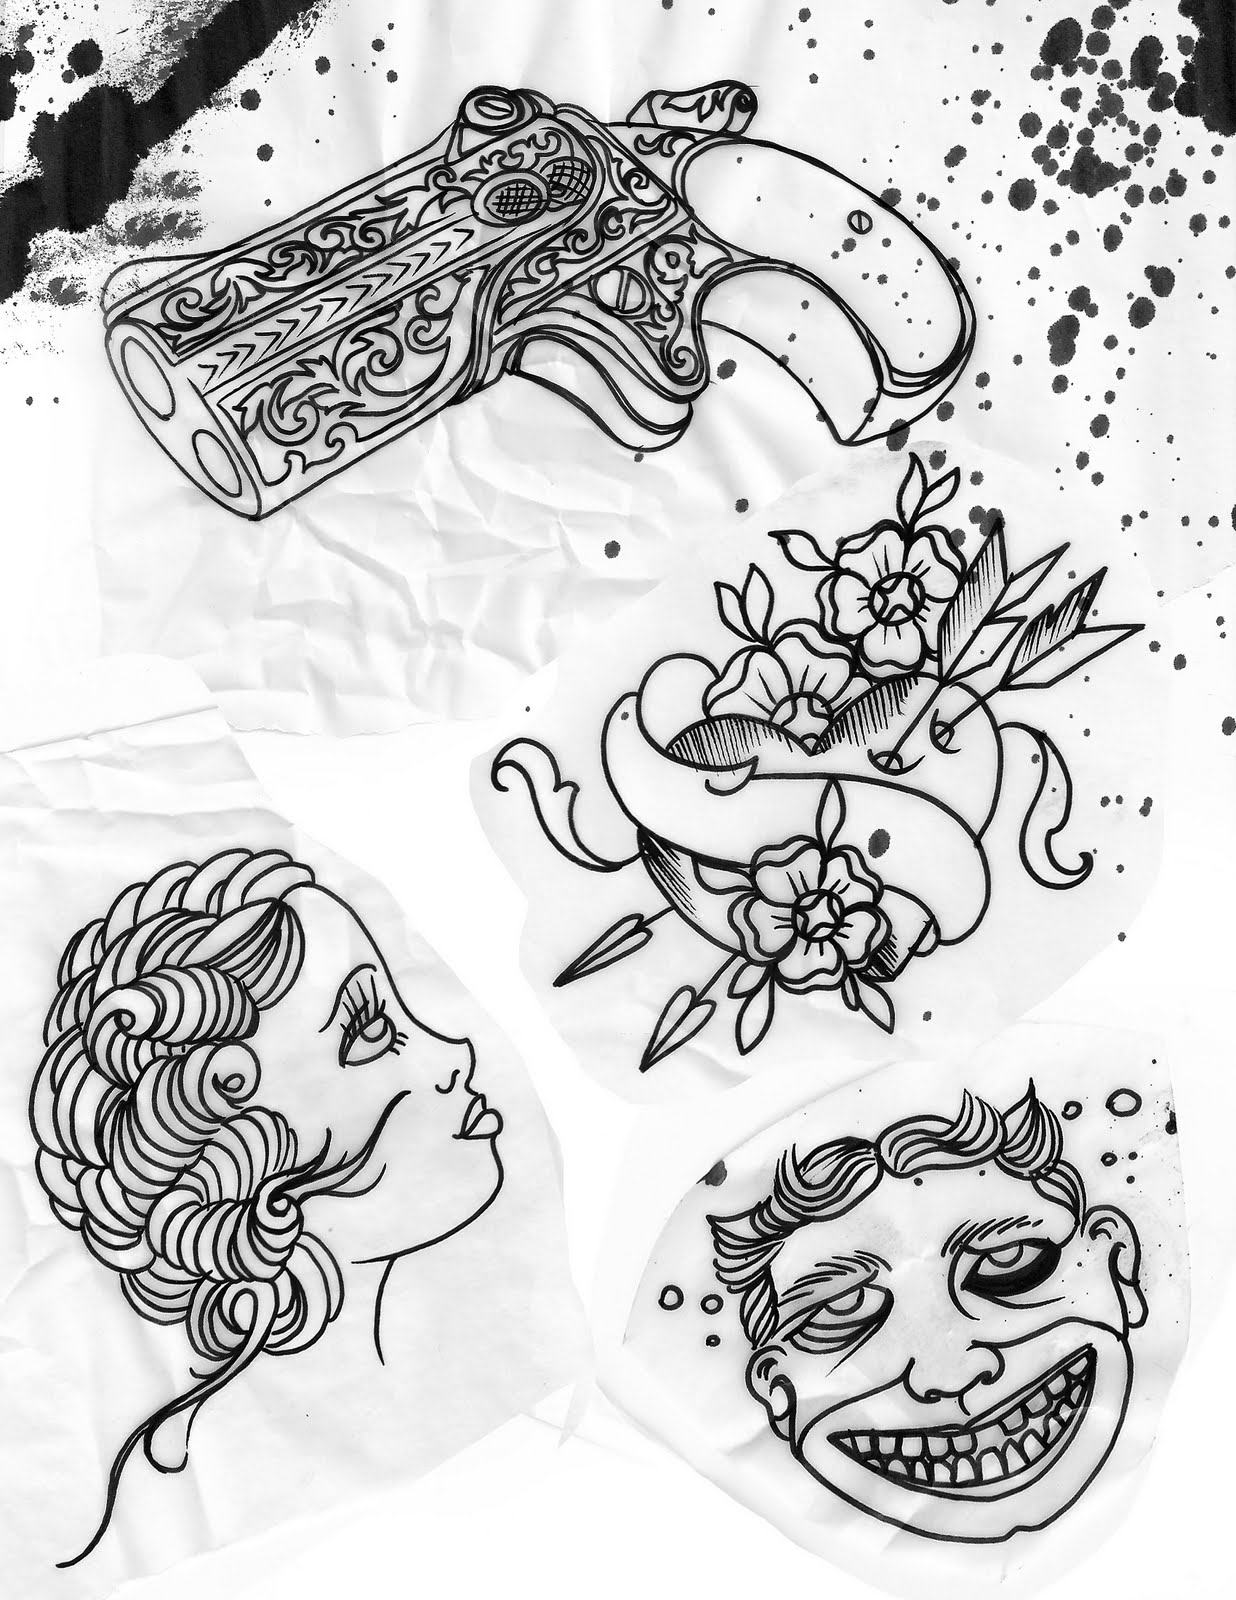 the skinny citizen ink blog 50 off custom tattoo designs 10 24 10 31. Black Bedroom Furniture Sets. Home Design Ideas